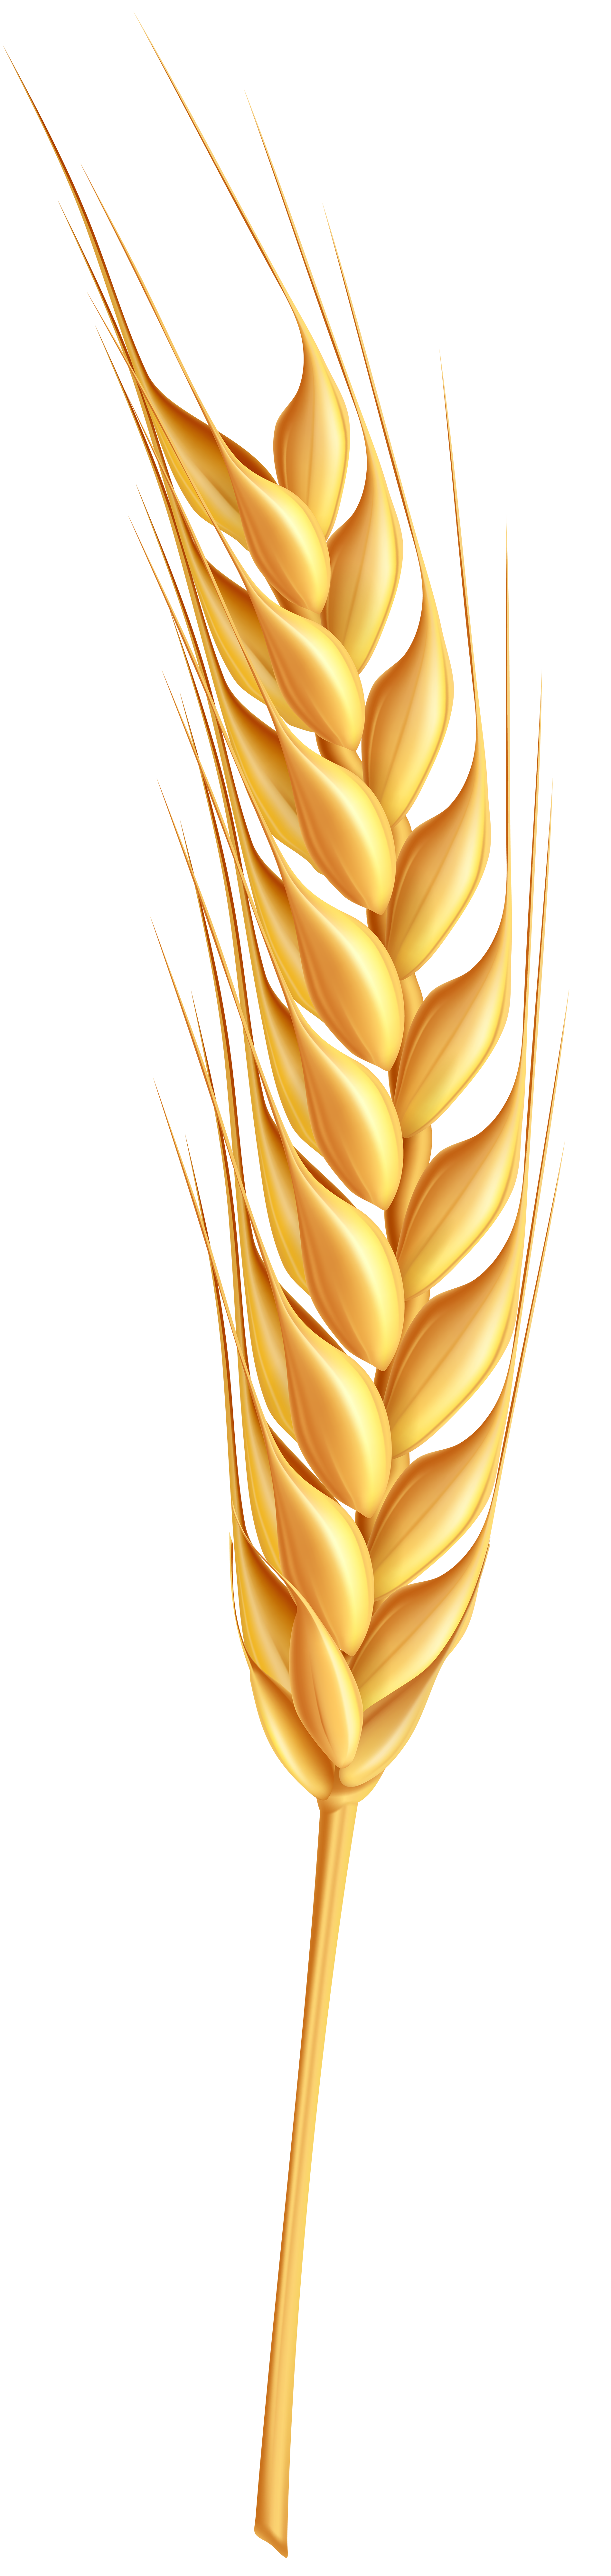 Clipground wheatear png clip. Wheat clipart ear wheat